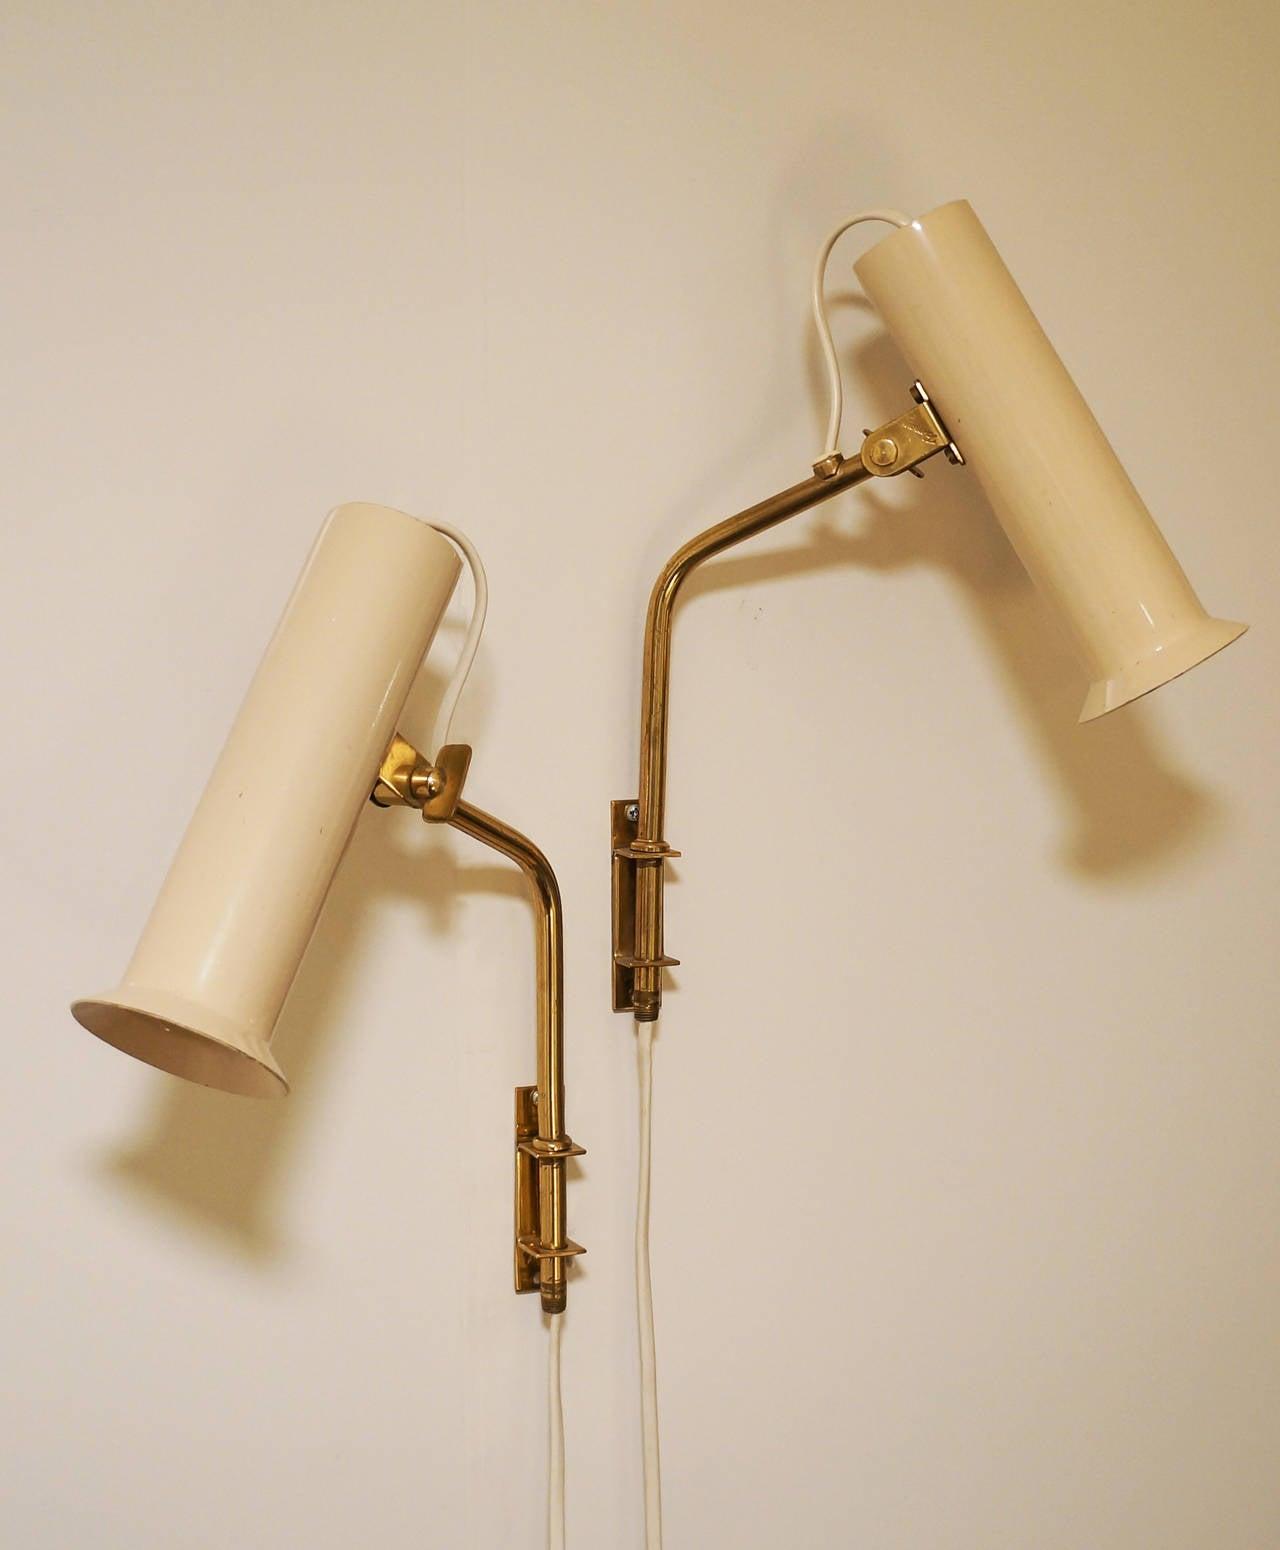 Scandinavian Modern Tapio Wirkkala Adjustable Reading Lamps or Sconces, 1950s For Sale